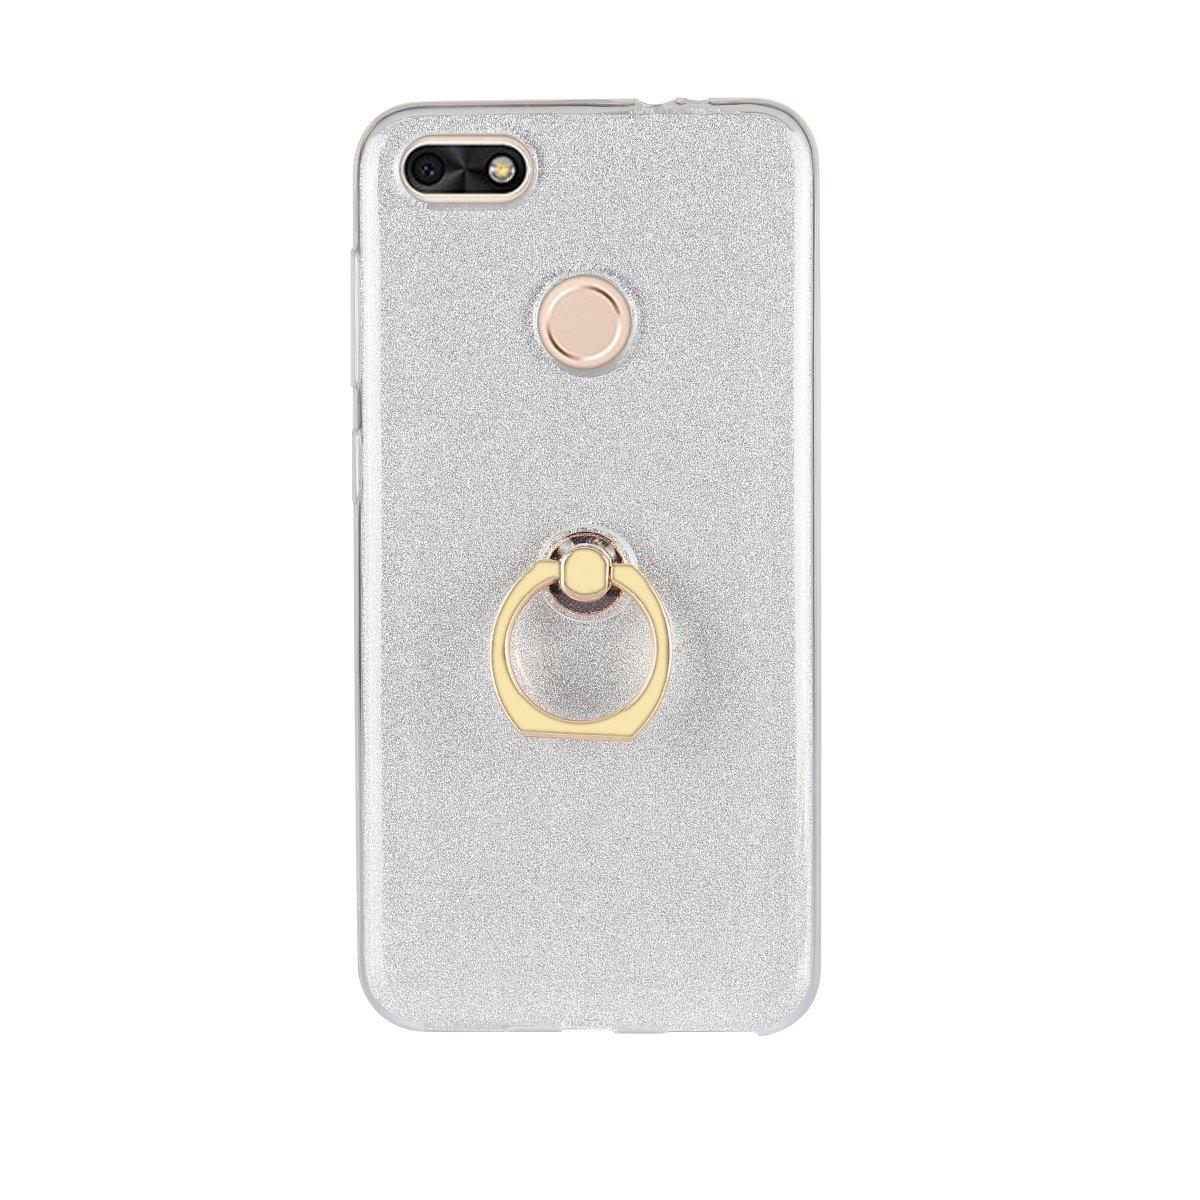 Everainy Kompatibel f/ür Huawei P9 Lite Mini//Y6 Pro 2017 H/ülle Silikon Bumper Gummi Neu Cover mit Ring 360 Grad St/änder H/üllen f/ür Huawei P9 Lite Mini Handyh/ülle Sto/ßfest Sto/ßstange Schutzh/ülle Rot